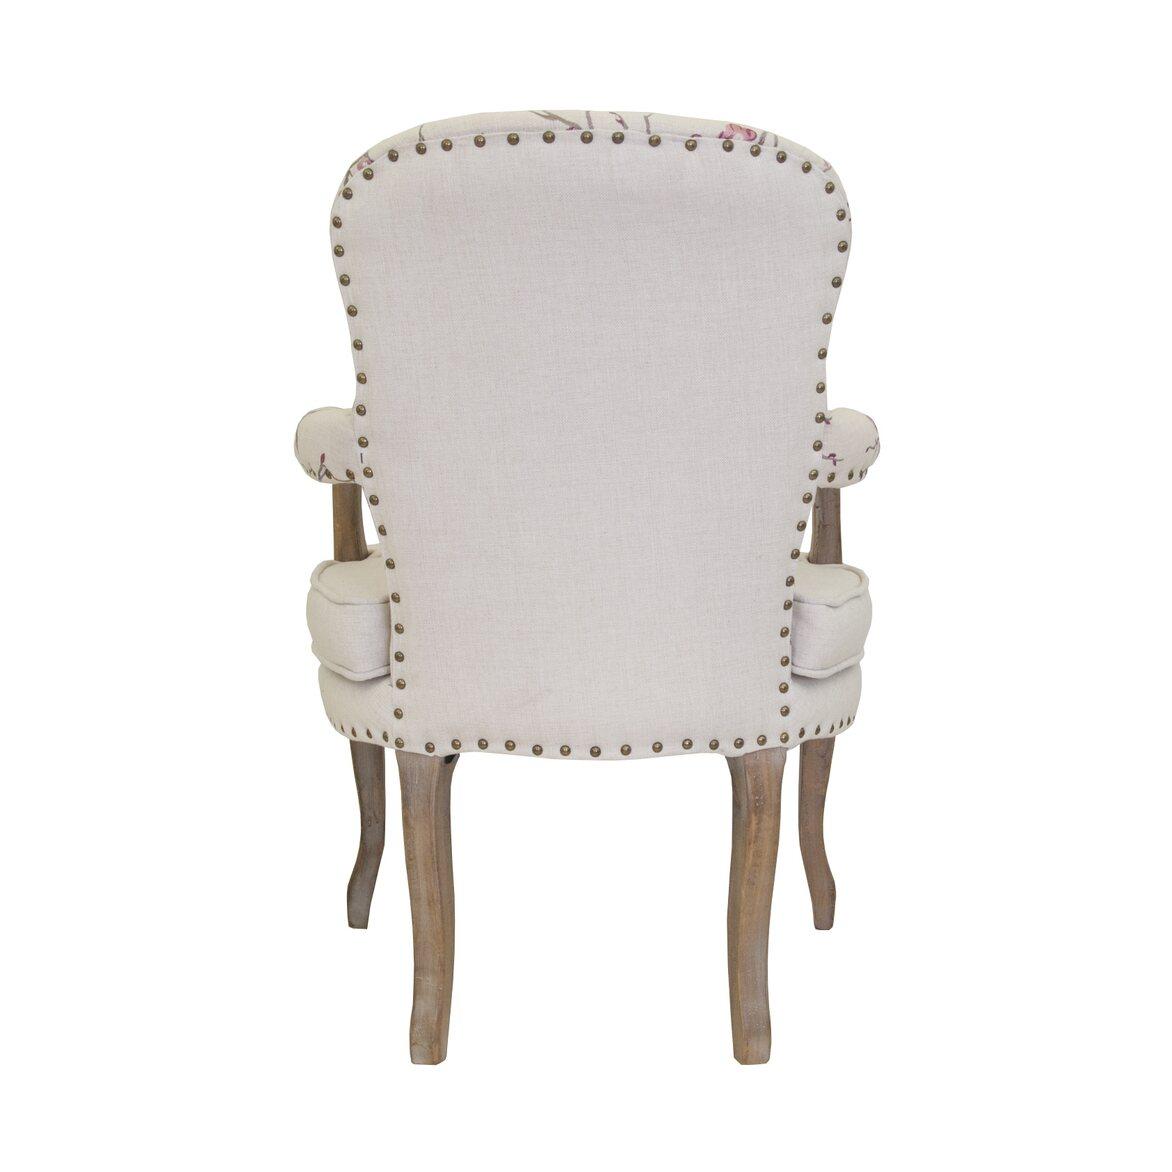 Кресло Anver sakura 3 | Кресло-стул Kingsby